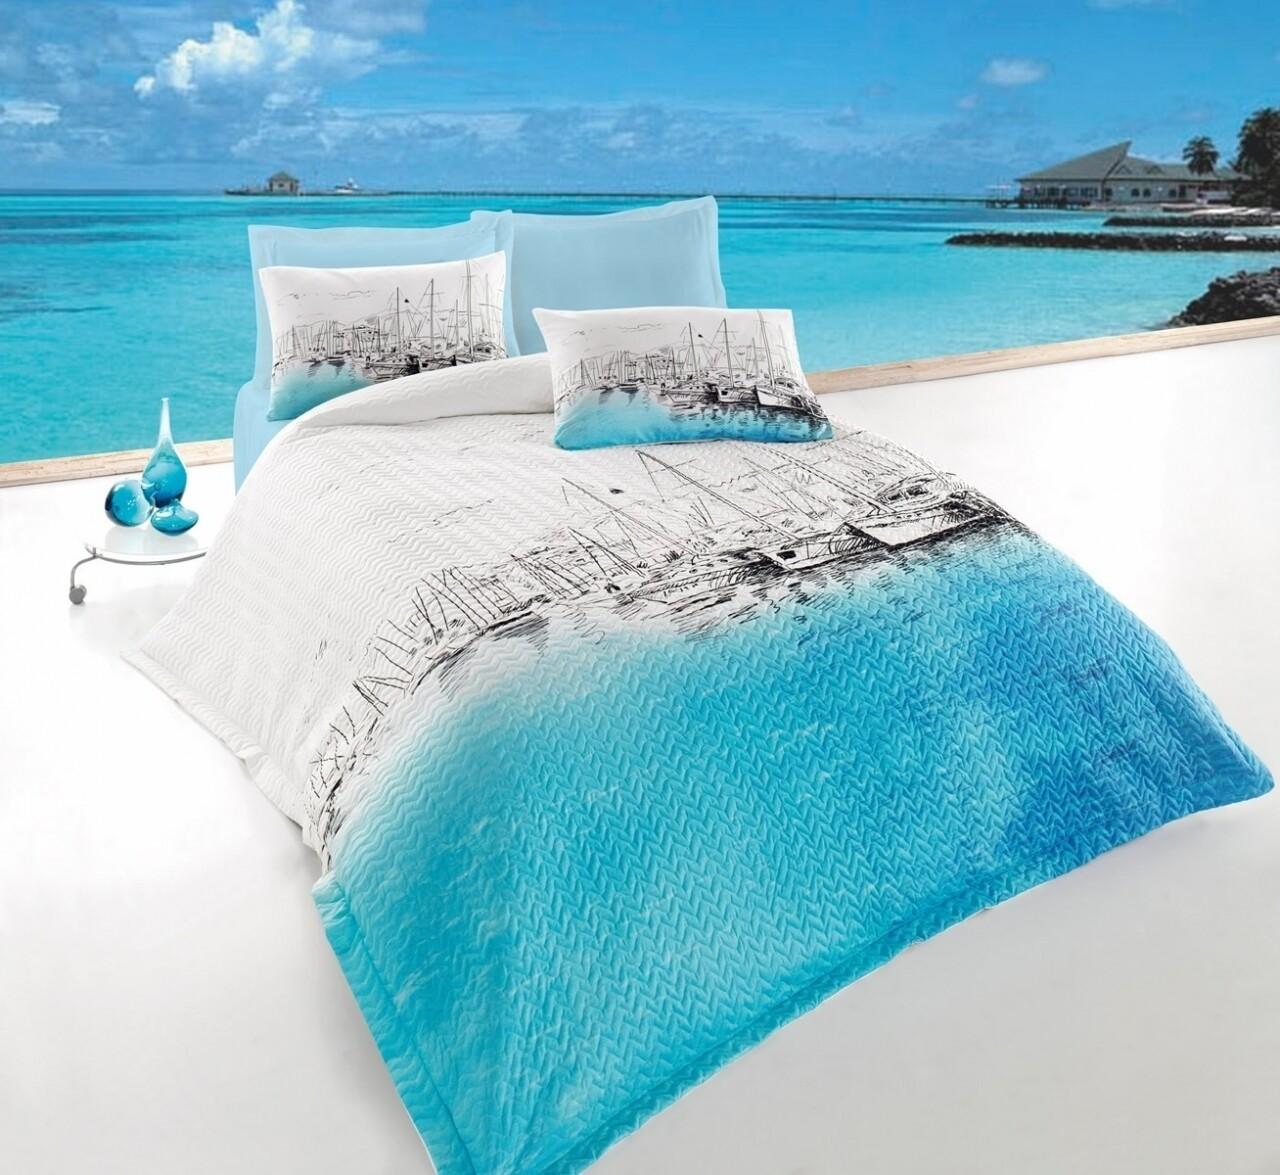 Lenjerie de pat matlasata pentru o persoana, 3 piese, 100% bumbac ranforce, Cotton Box, Marina Blue